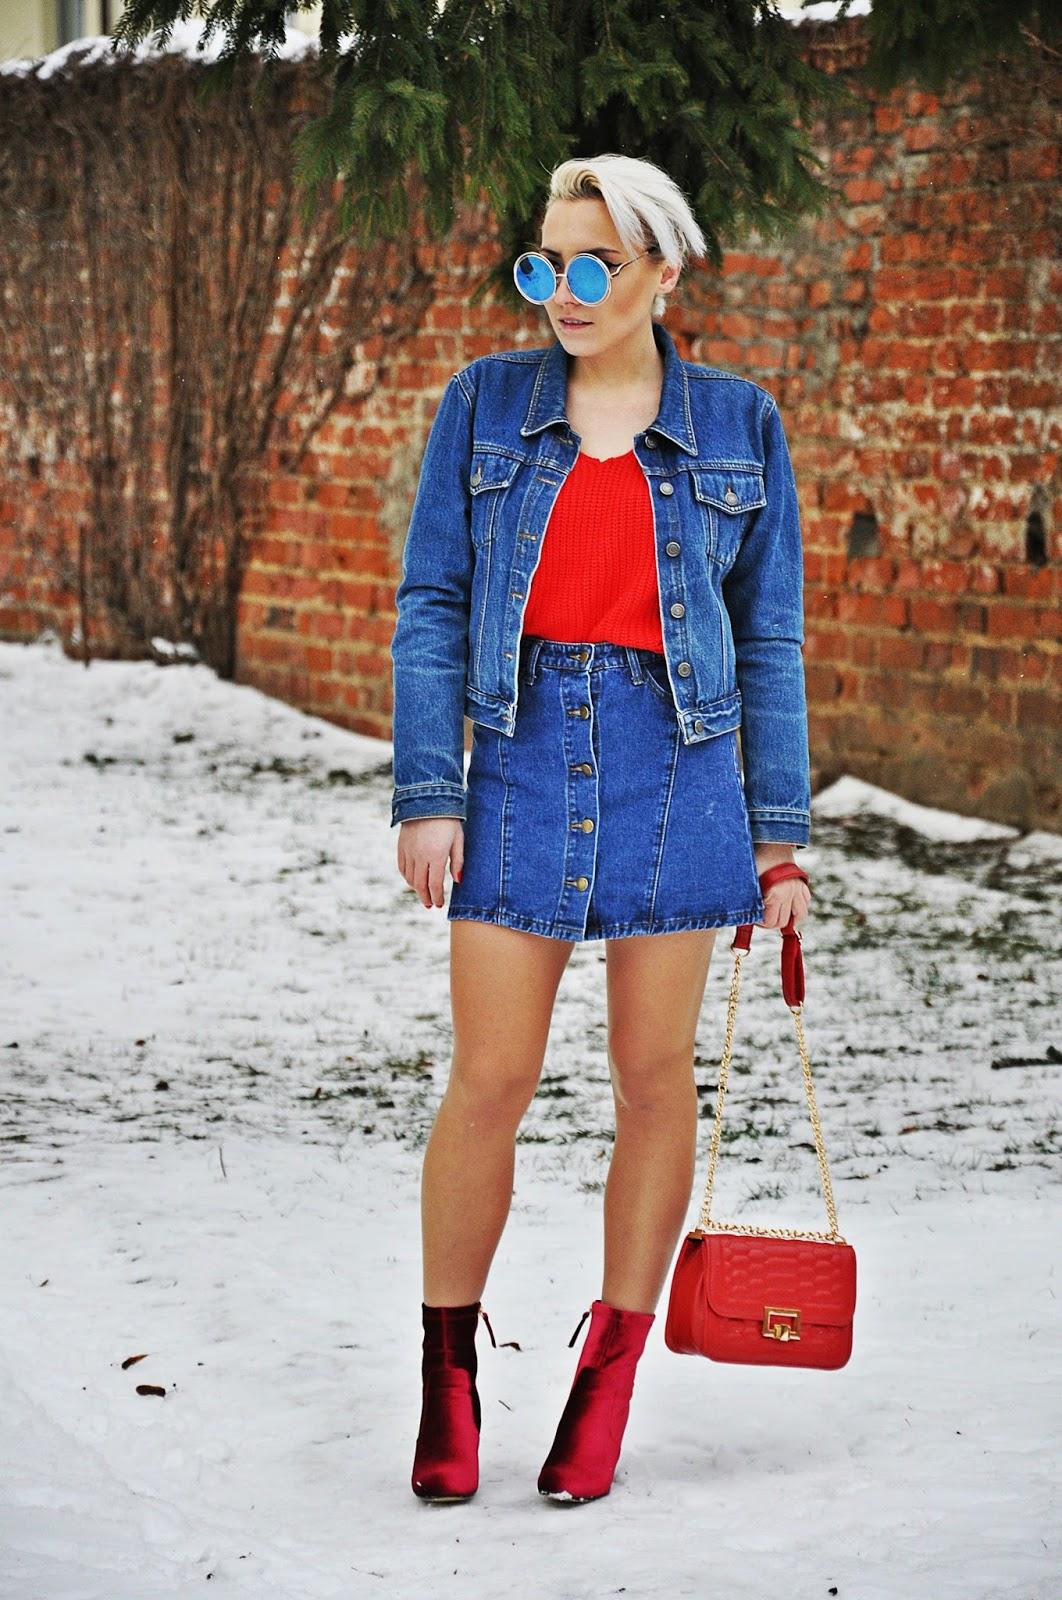 czerwona_torebka_denim_jacket_look_karyn_010217